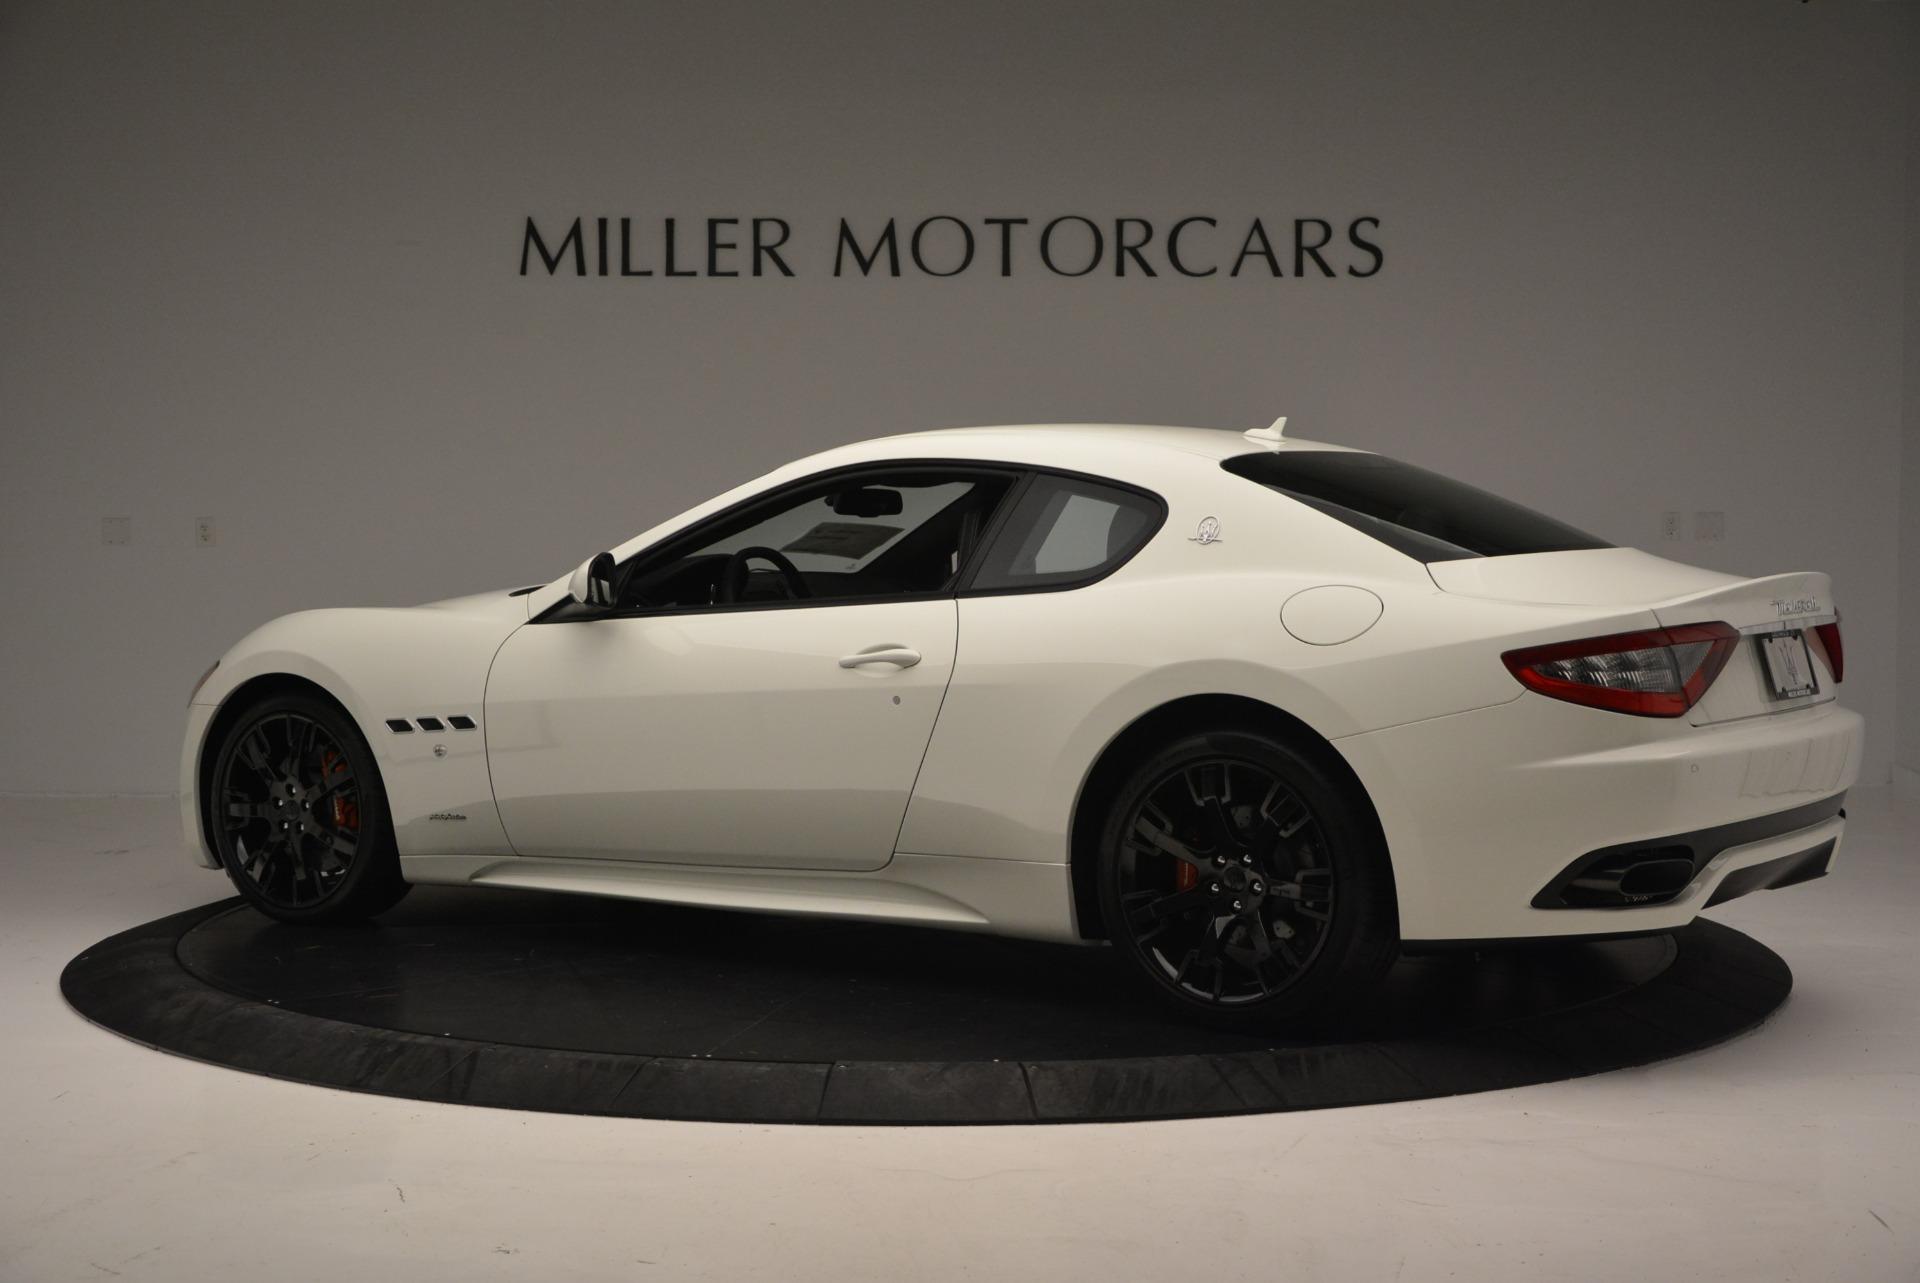 New 2016 Maserati GranTurismo Sport For Sale In Westport, CT 167_p3